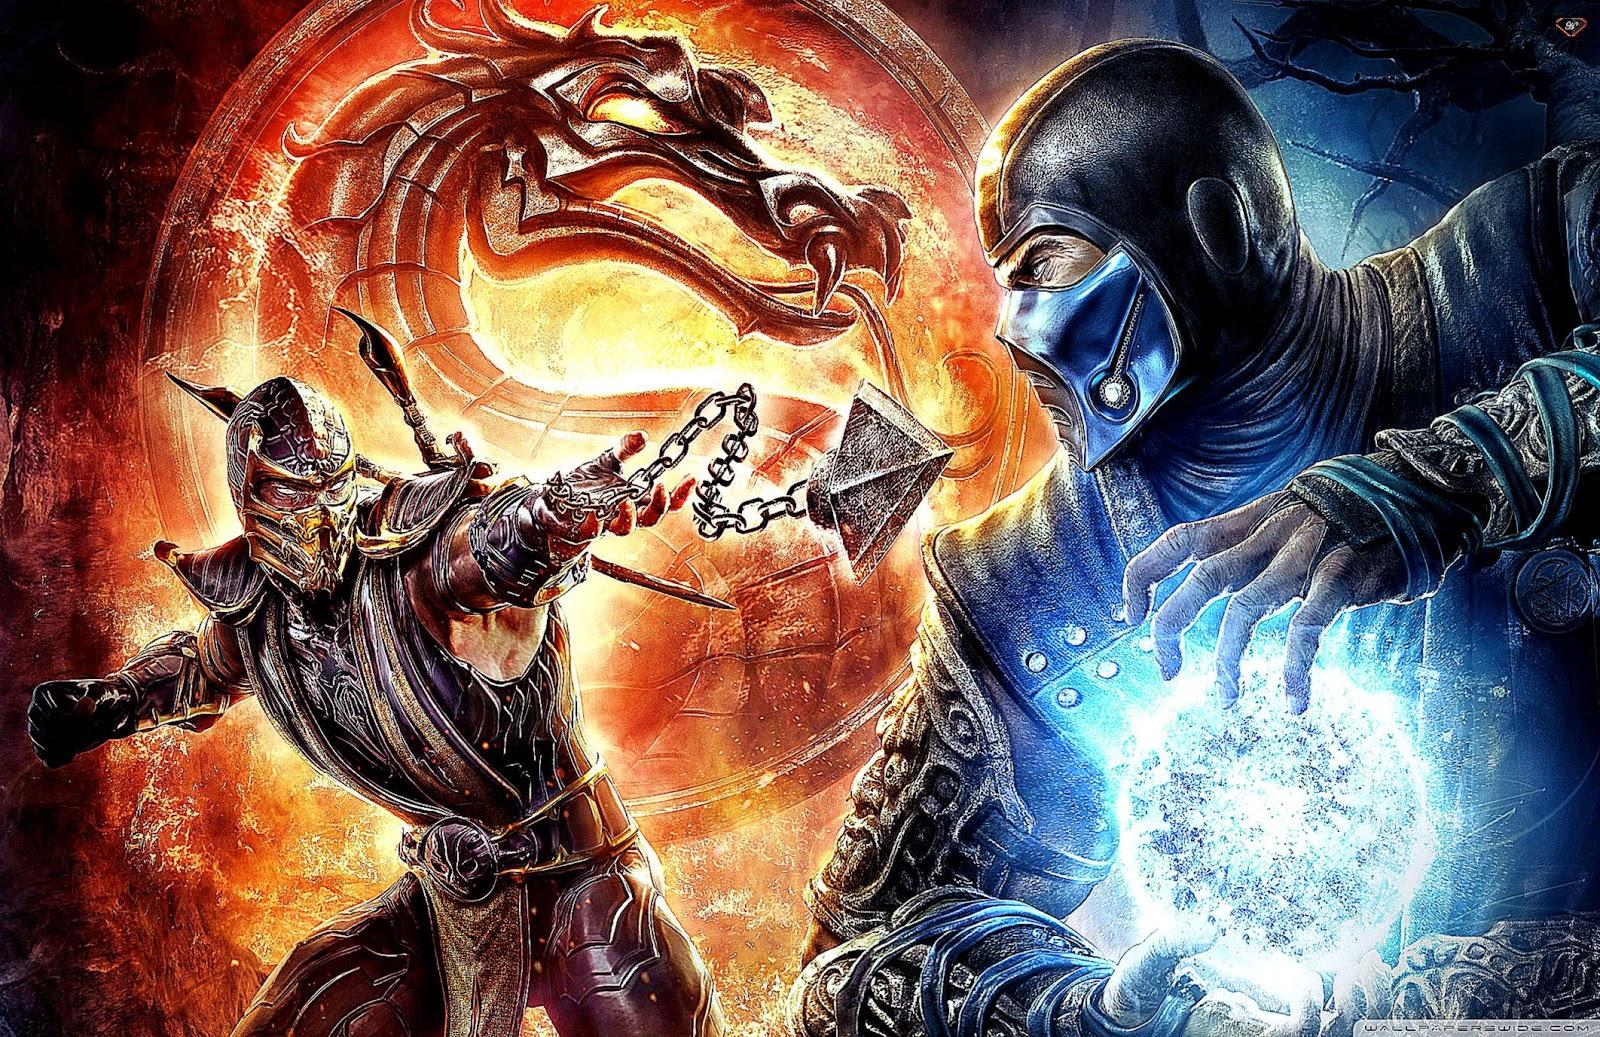 Mortal Kombat Wallpapers   Full HD wallpaper search